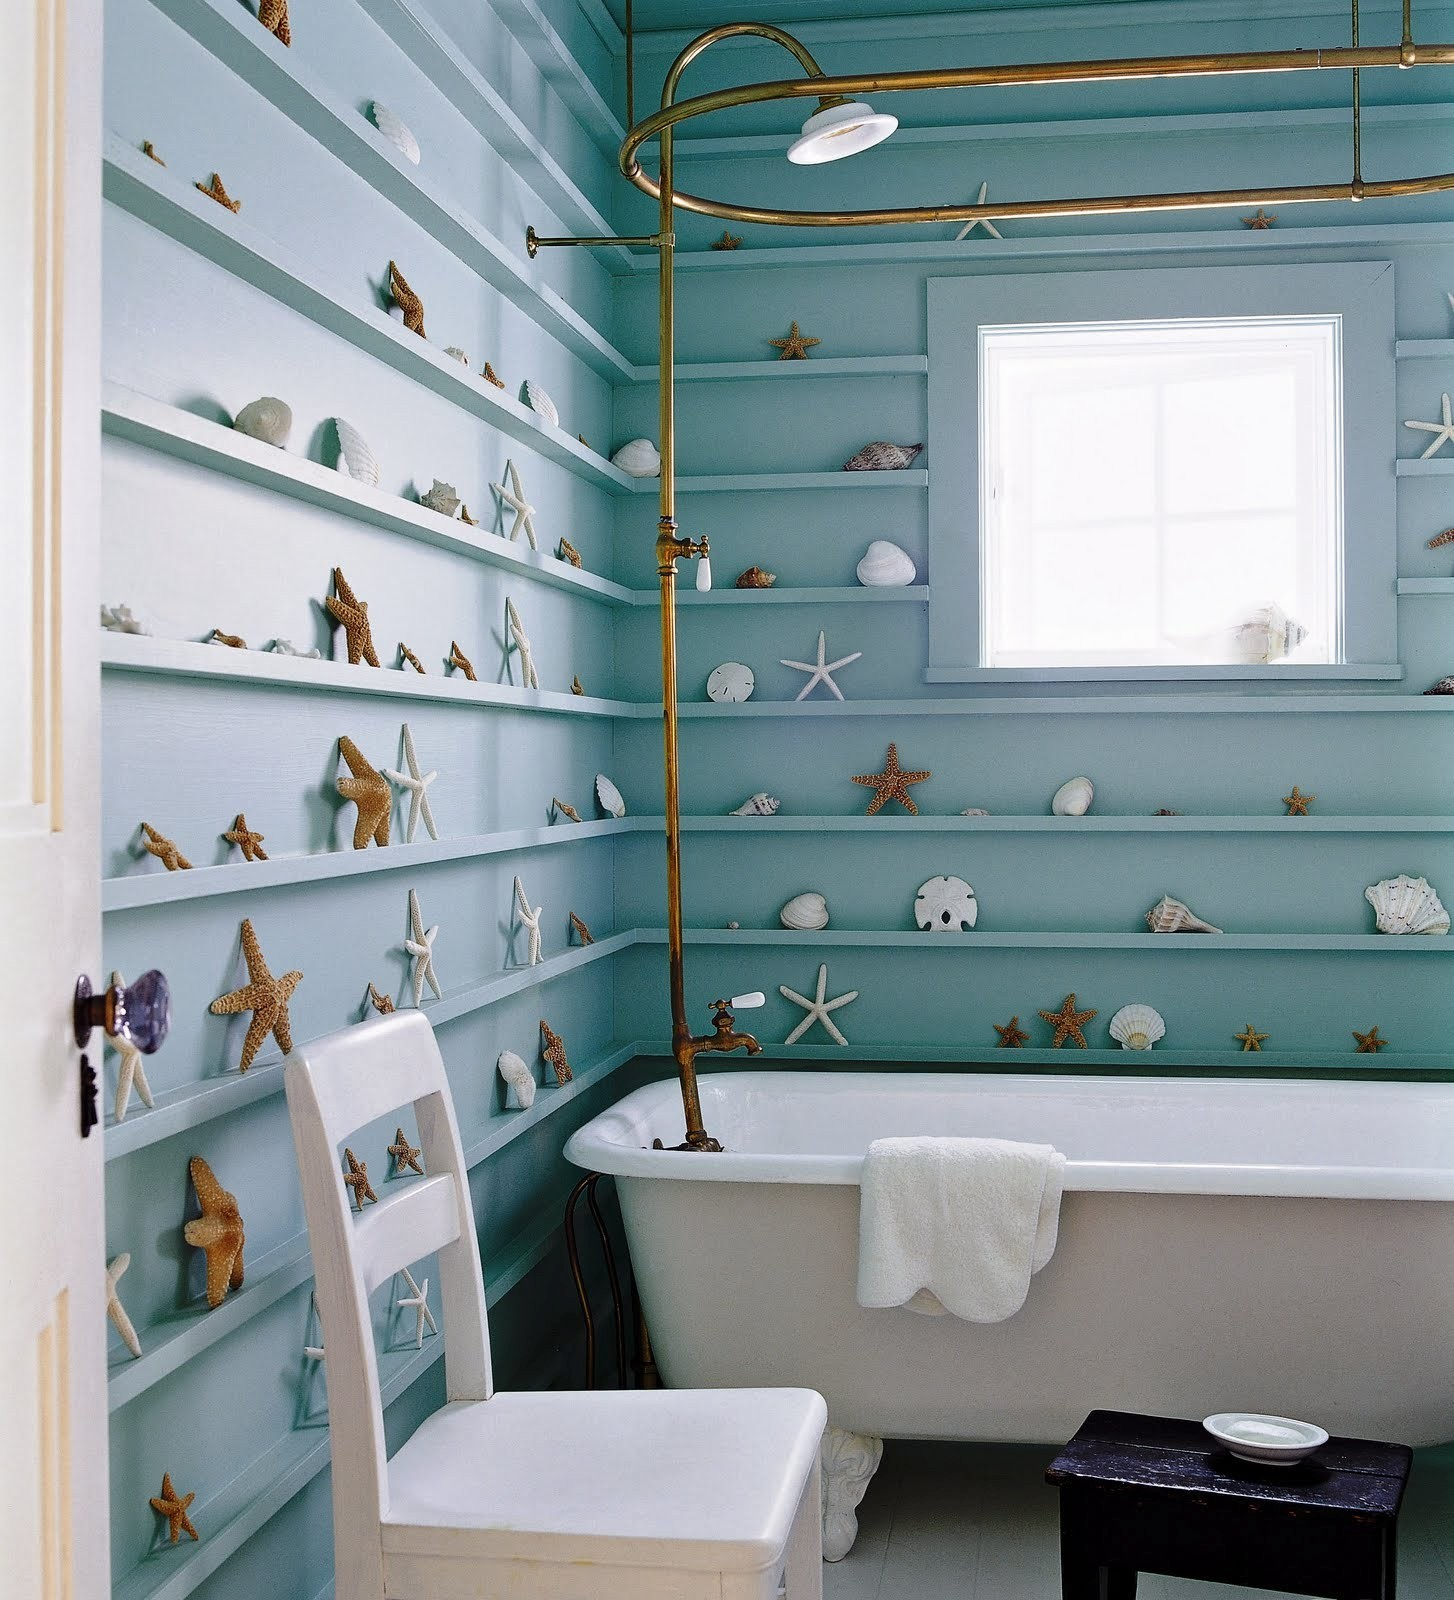 Sea themed Bathroom Beautiful Sea Style Bathroom Interior and Decorating Inspiration Home Image